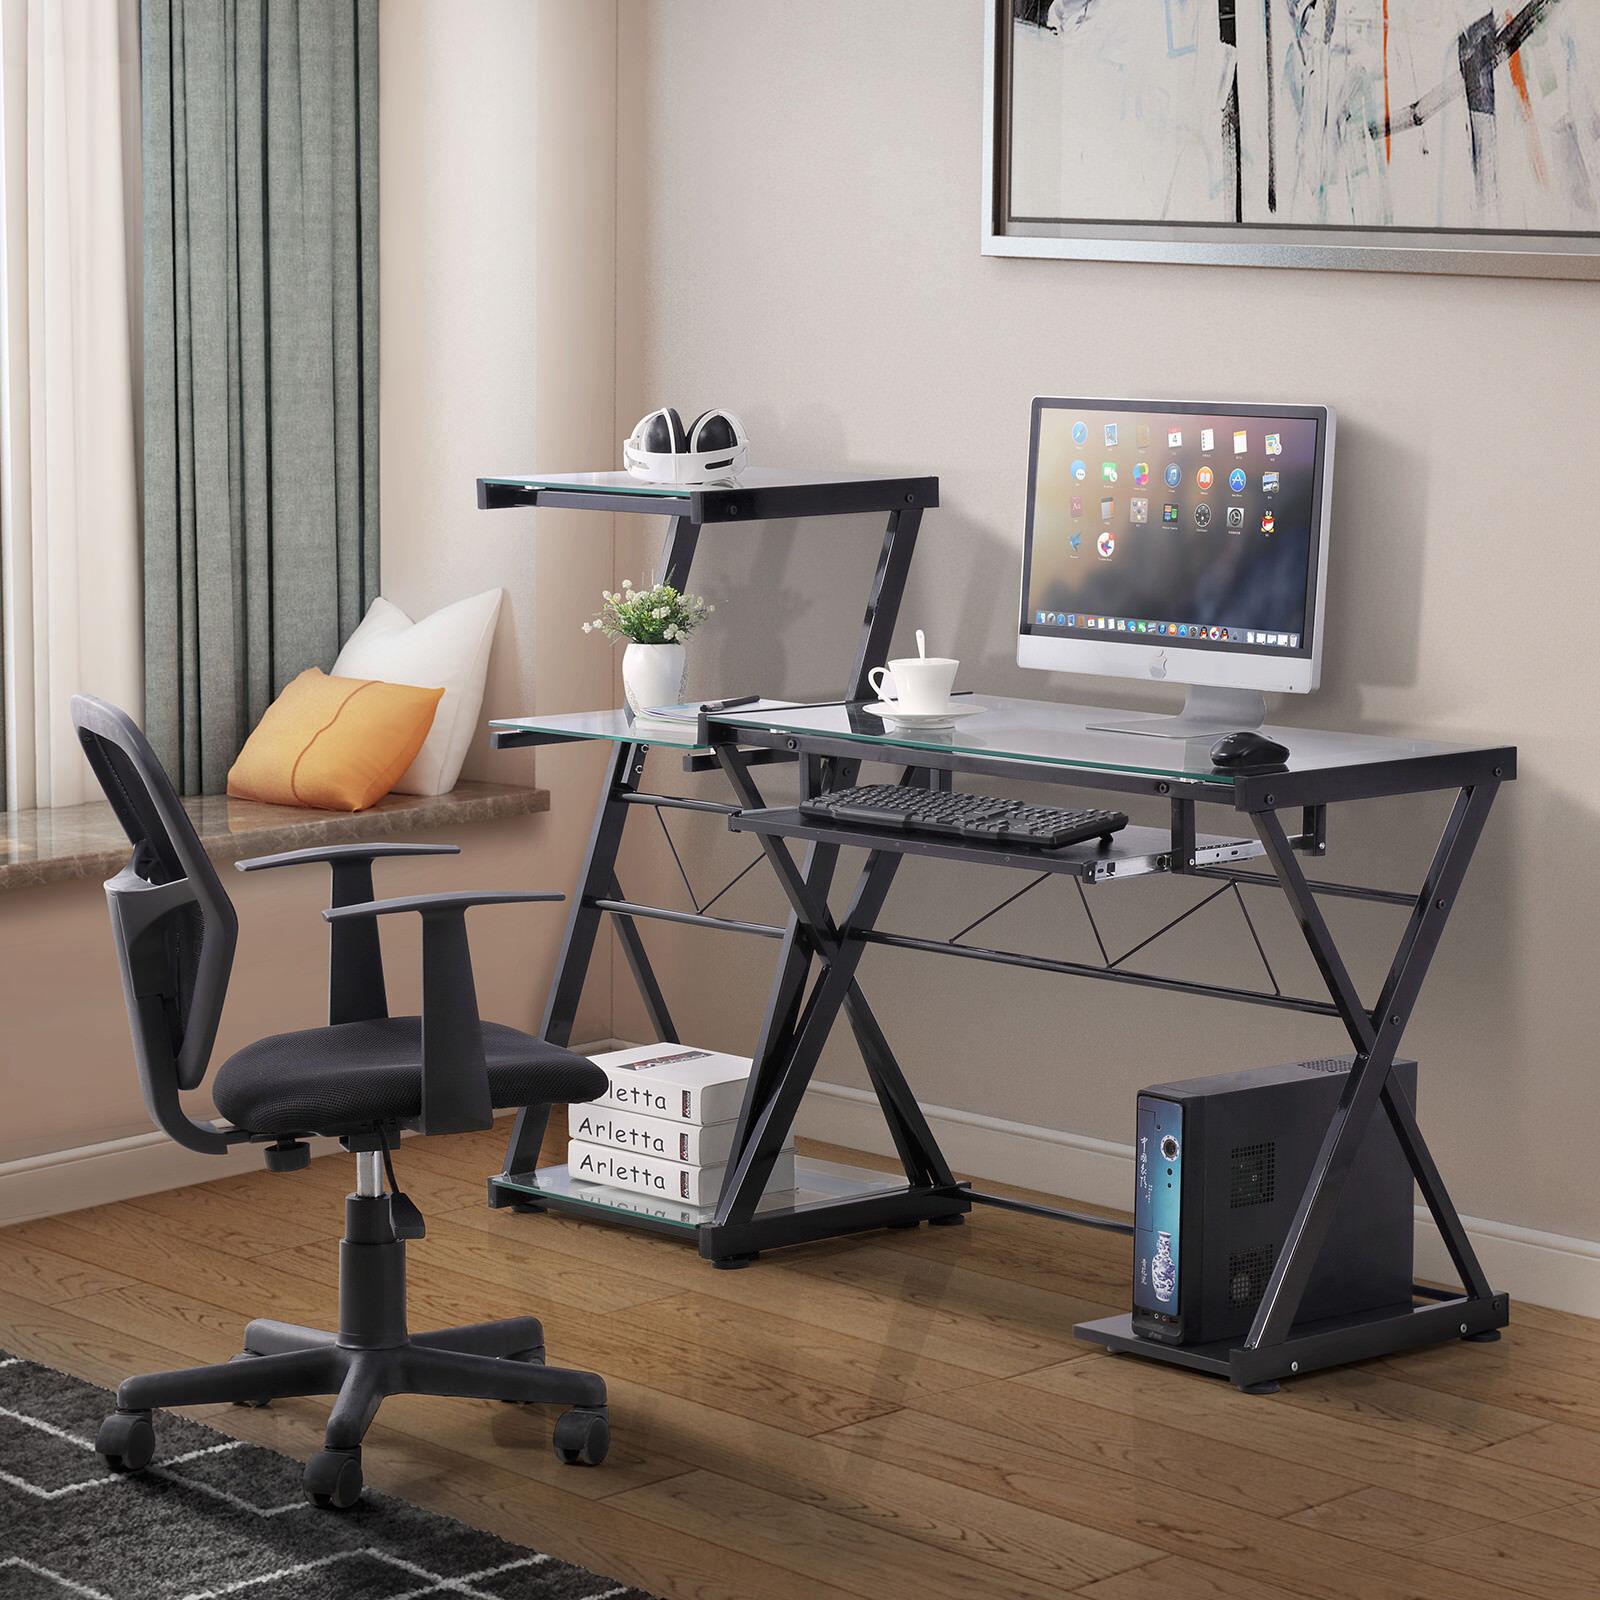 Details About PC Computer Desk Laptop Table Corner Workstatio N Office Home  Furniture Modern